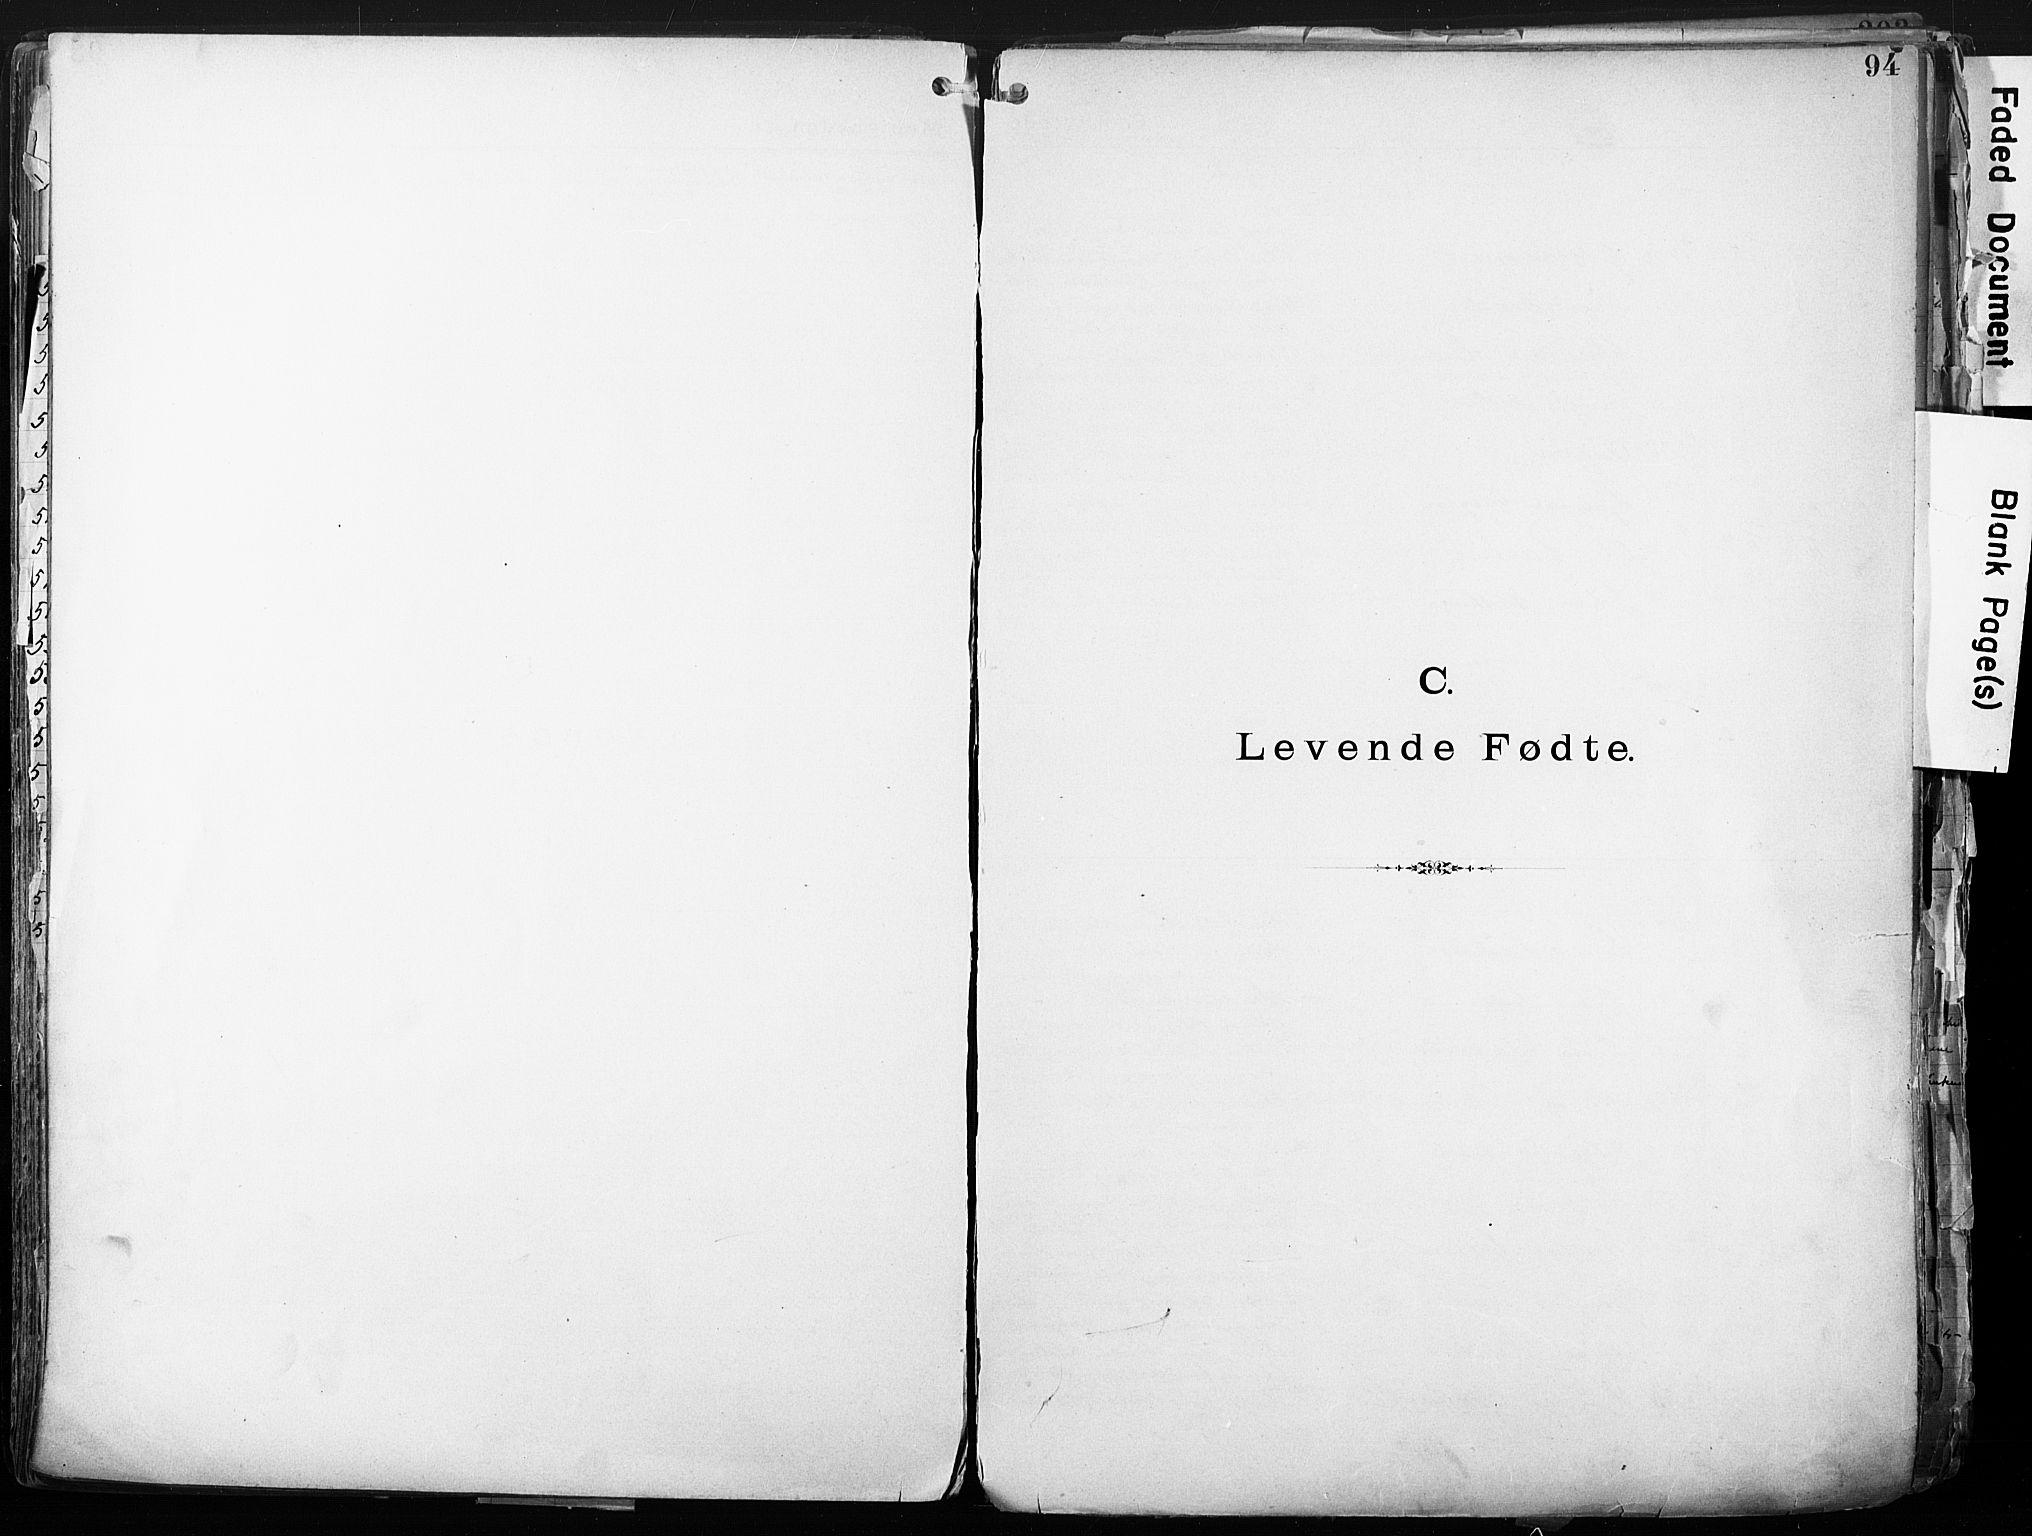 SAO, Sarpsborg metodistkirke, A/L0004: Dissenterprotokoll nr. 4, 1892-1923, s. 94